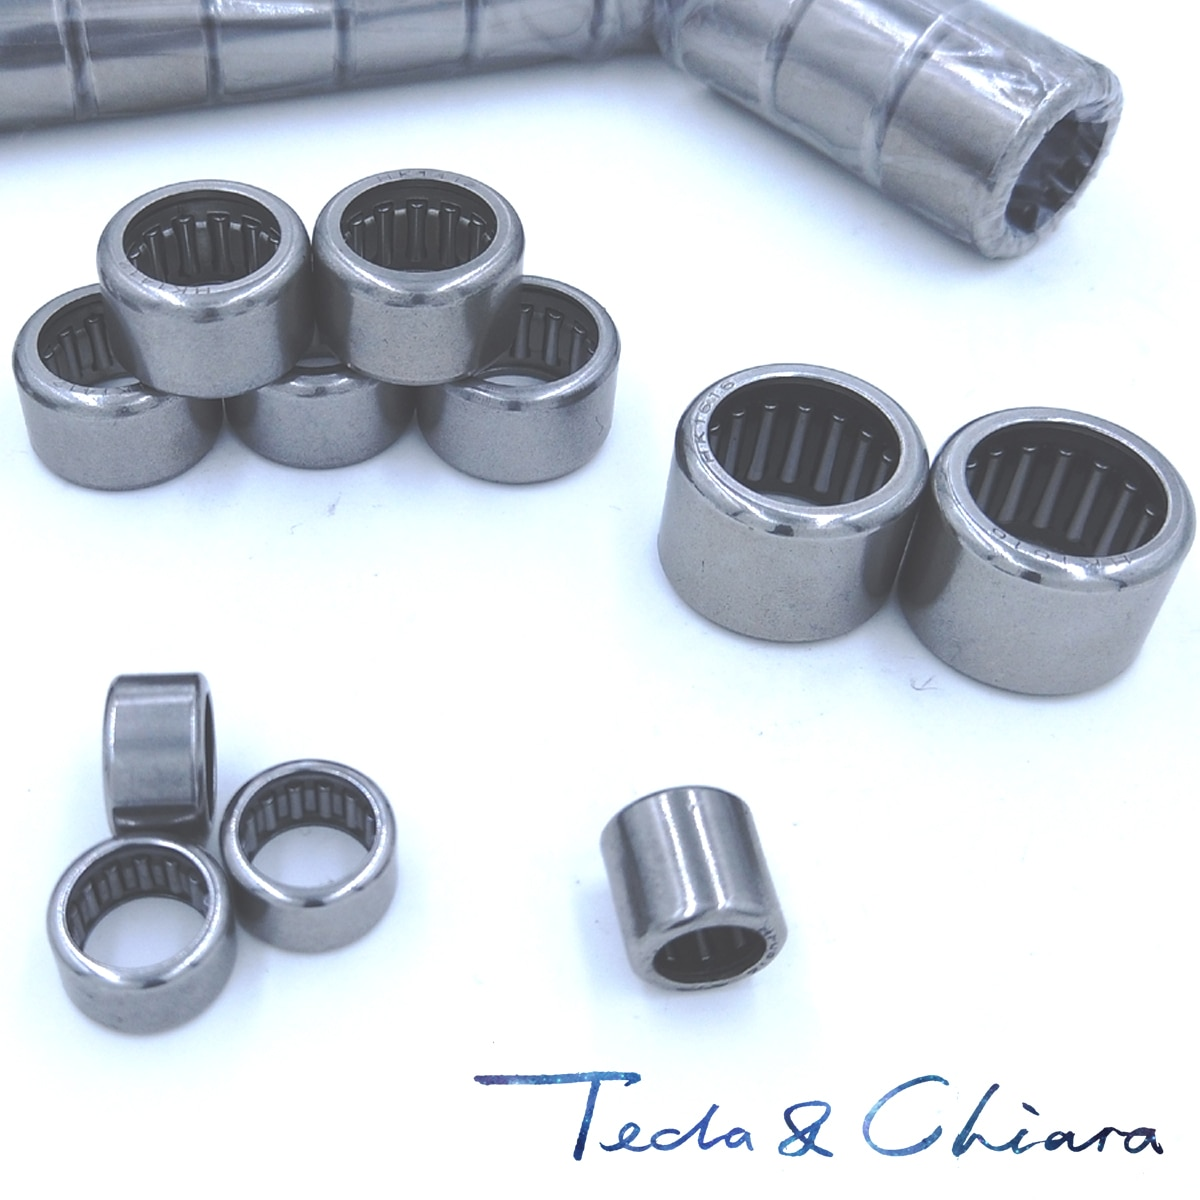 5Pcs HK142012 HK1412 37941/14 Drawn Cup Type Needle Roller Bearing 14 x 20 x 12mmFree shipping High Quality